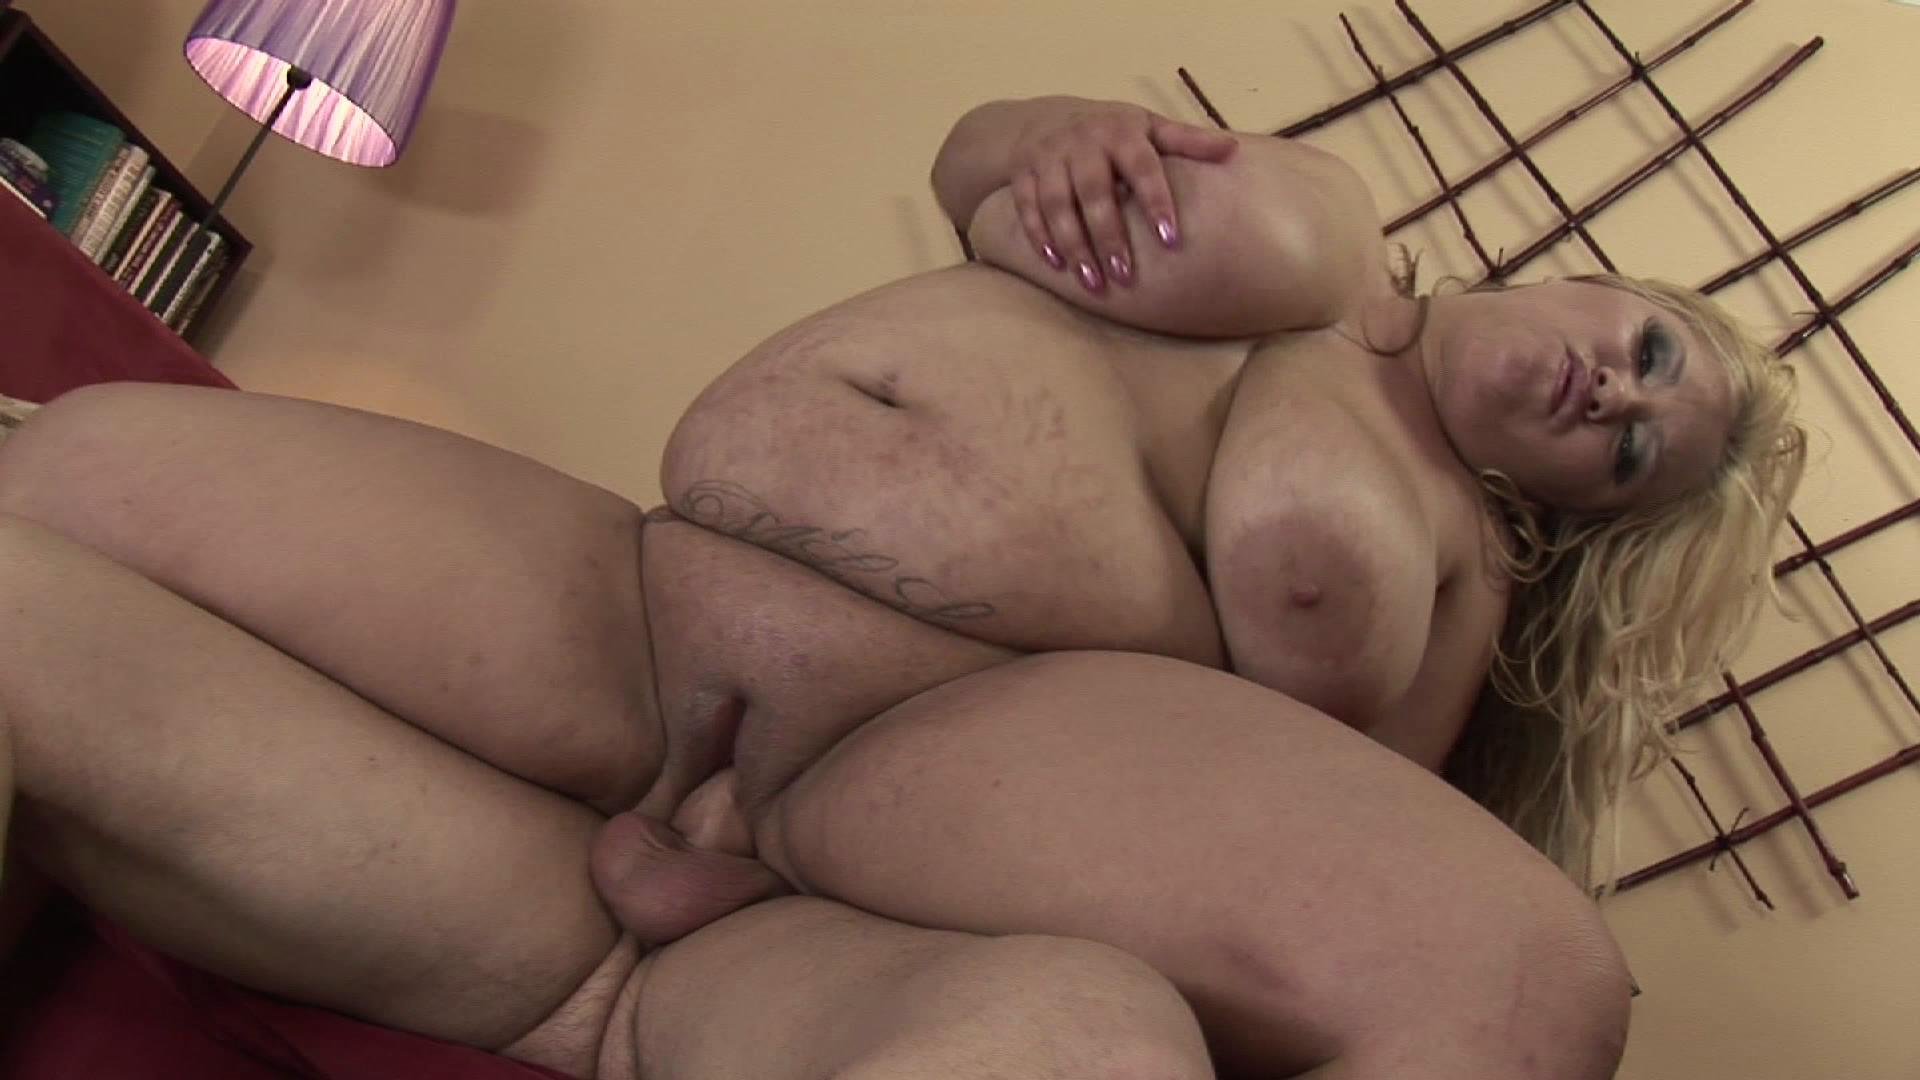 I Like Fat Girls 10 xvideos